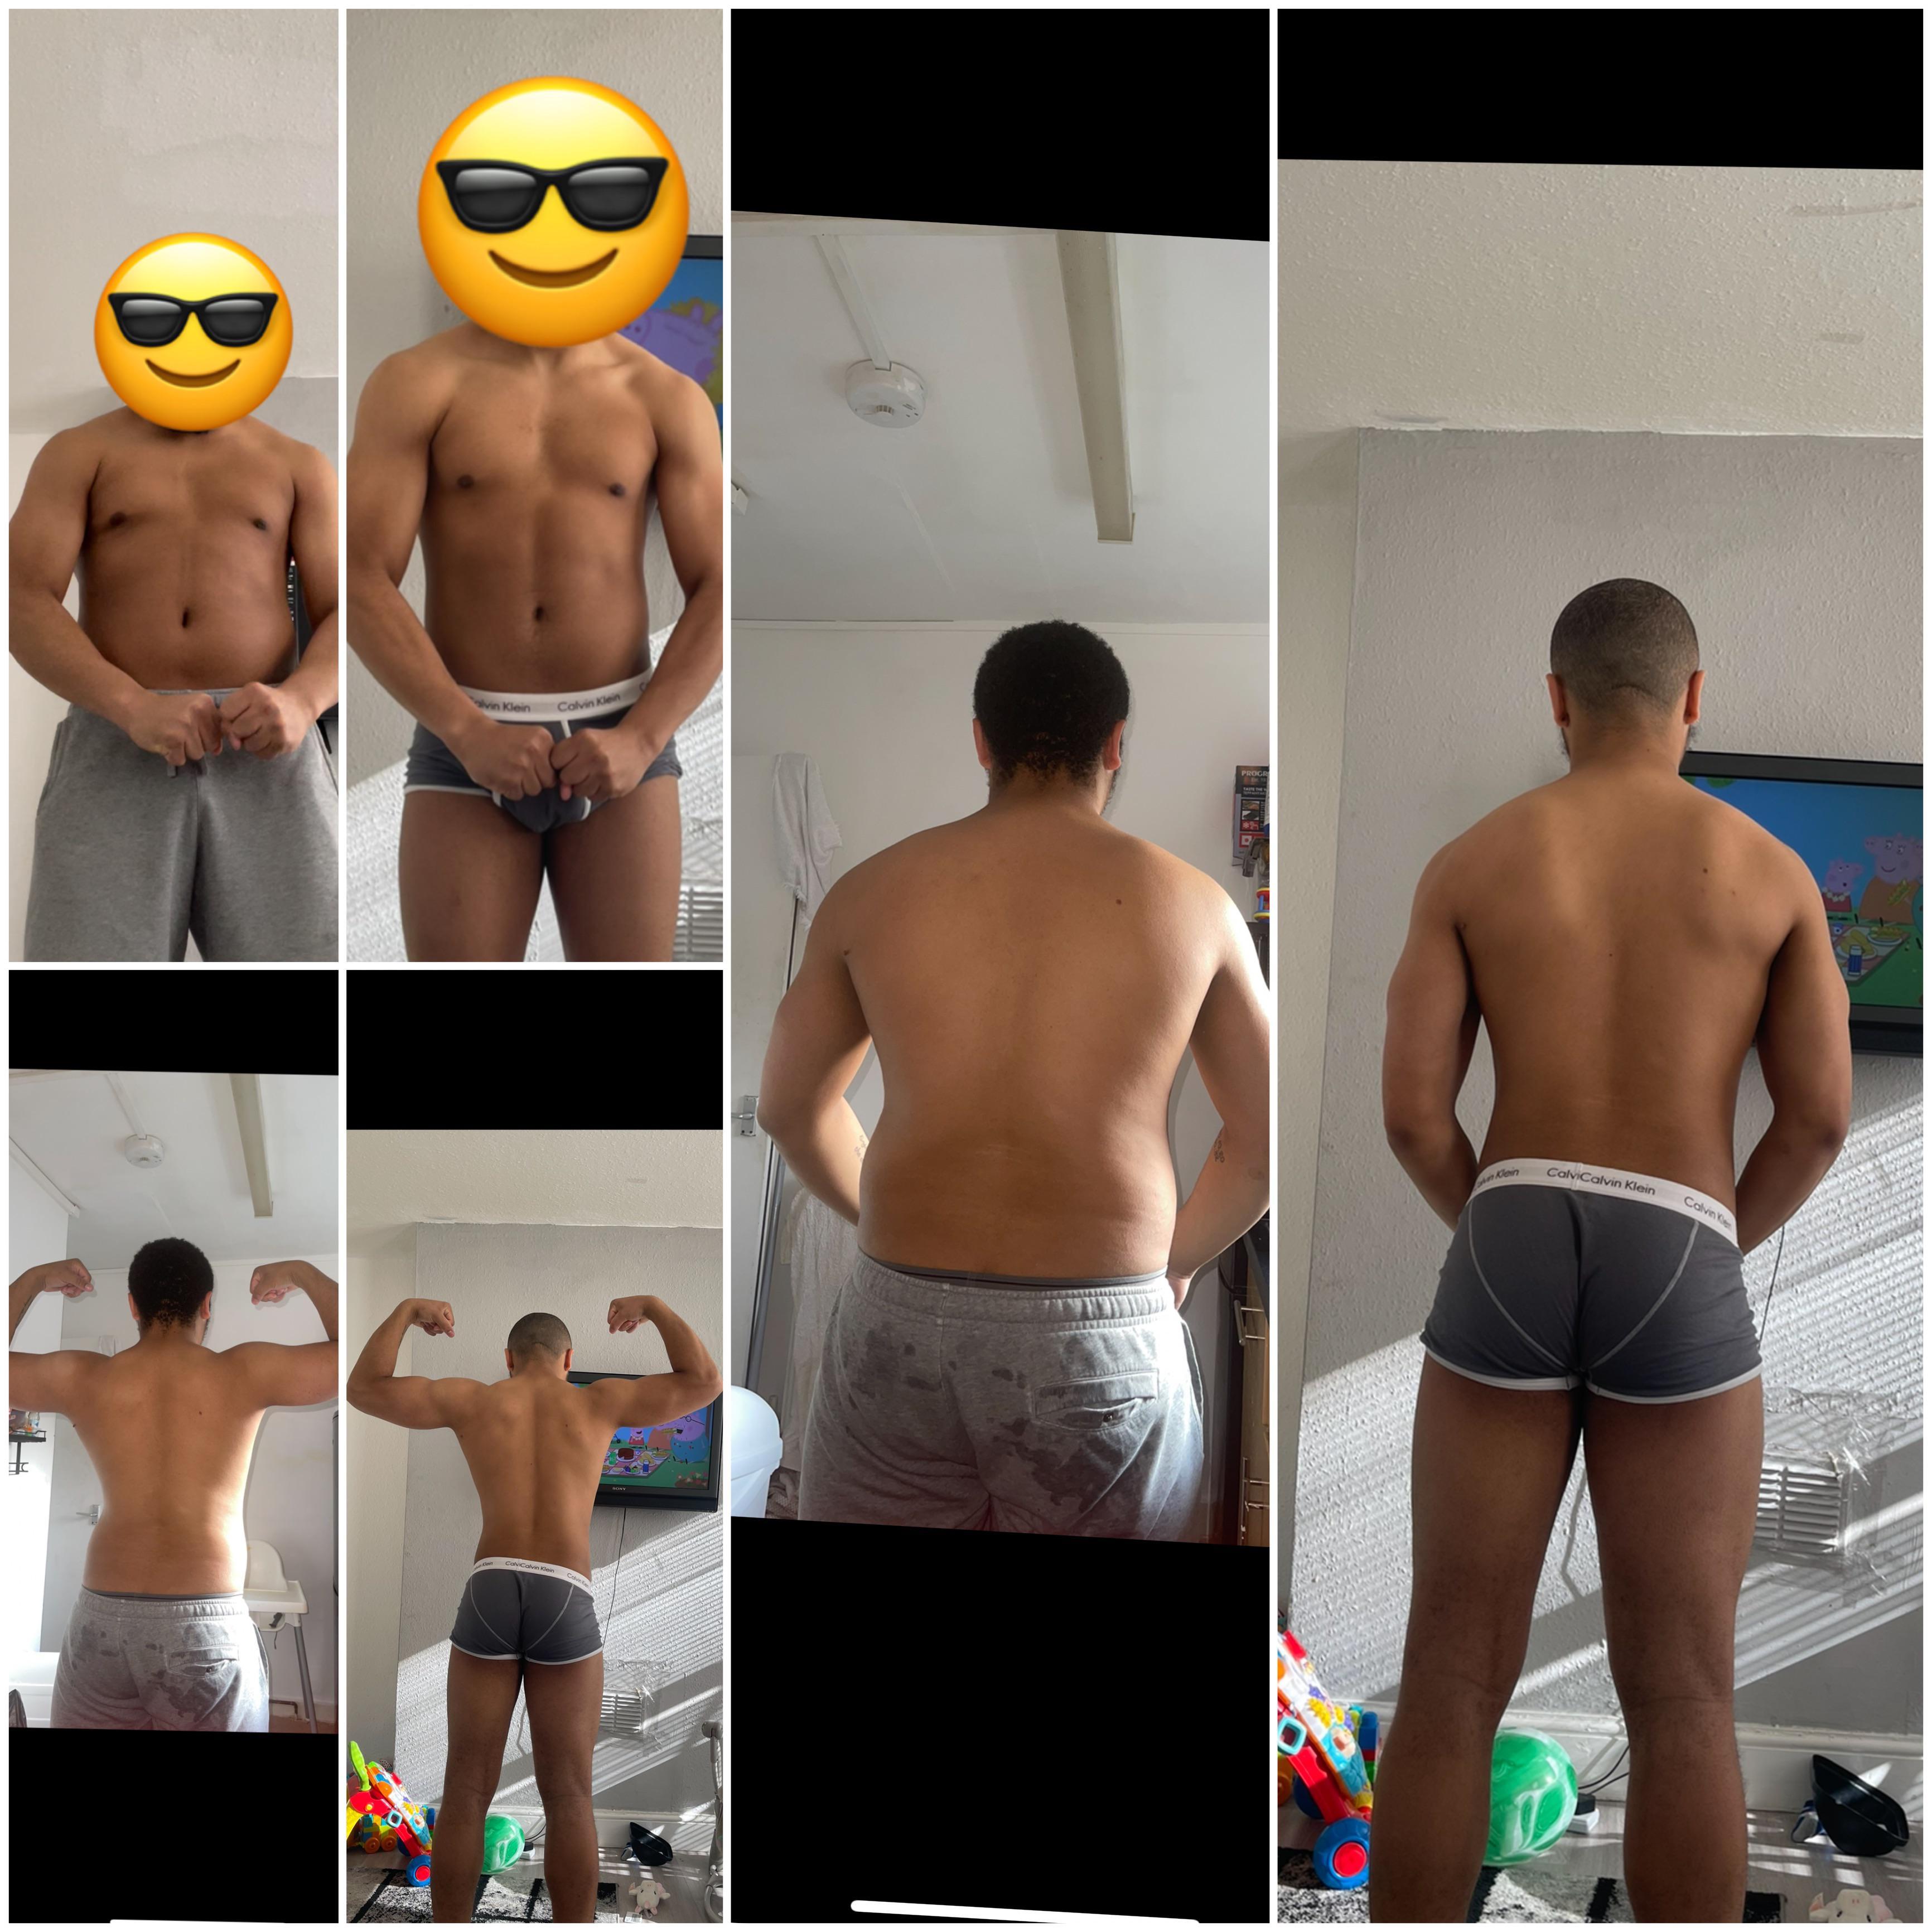 6 foot Male Progress Pics of 44 lbs Weight Loss 246 lbs to 202 lbs